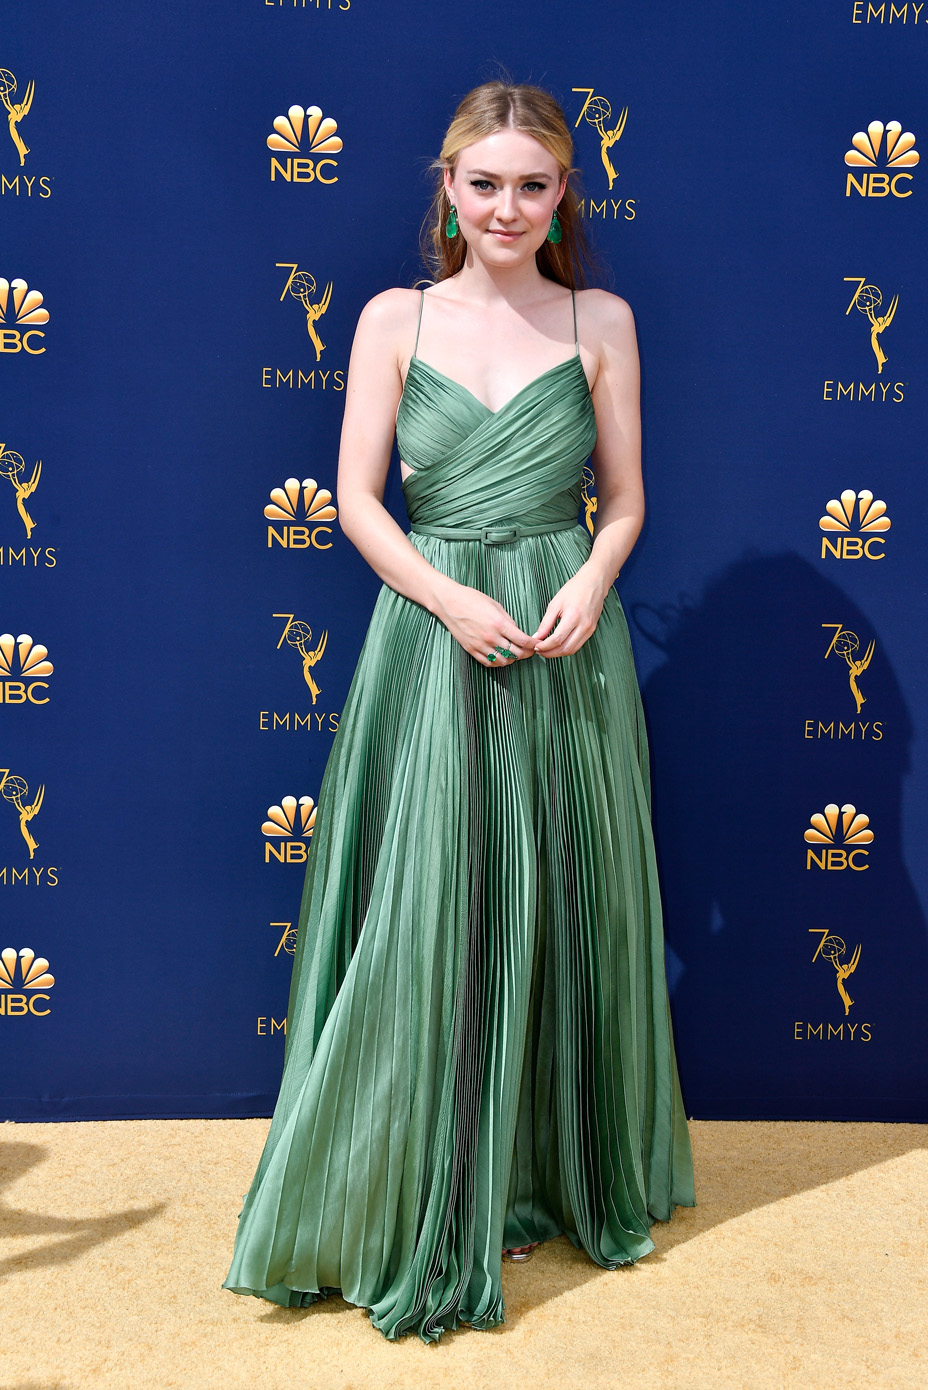 DakotaFanning-Emmys2018.jpg